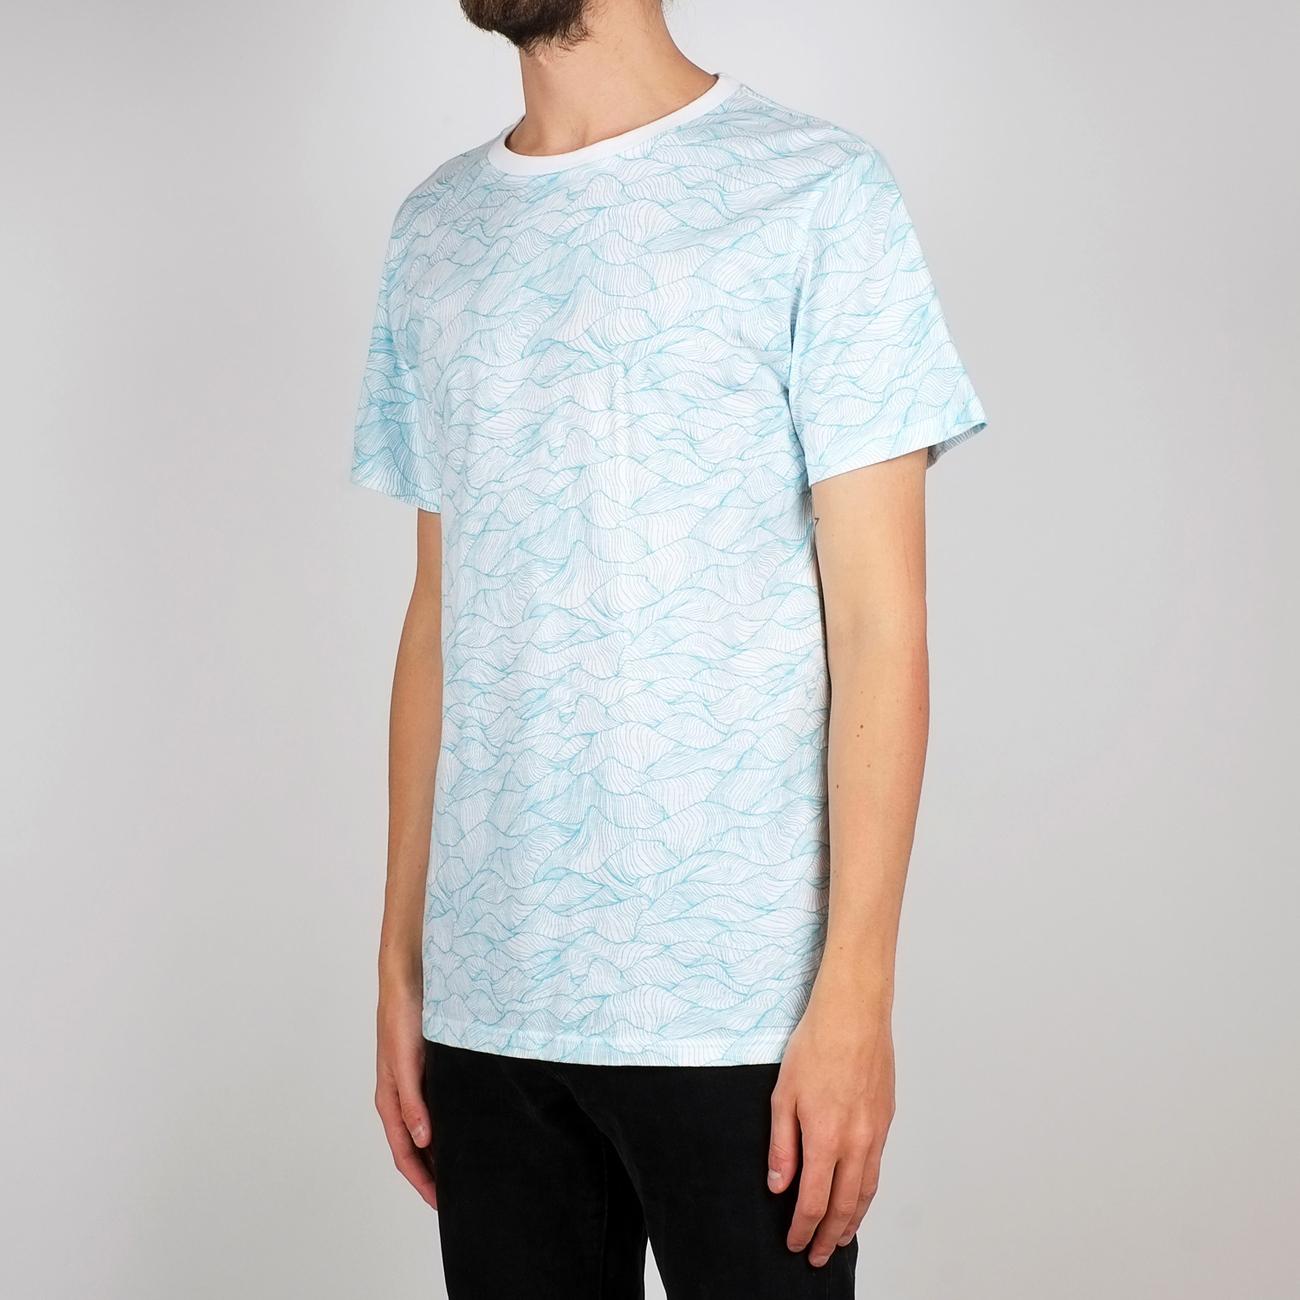 T-shirt Stockholm Ink Waves White